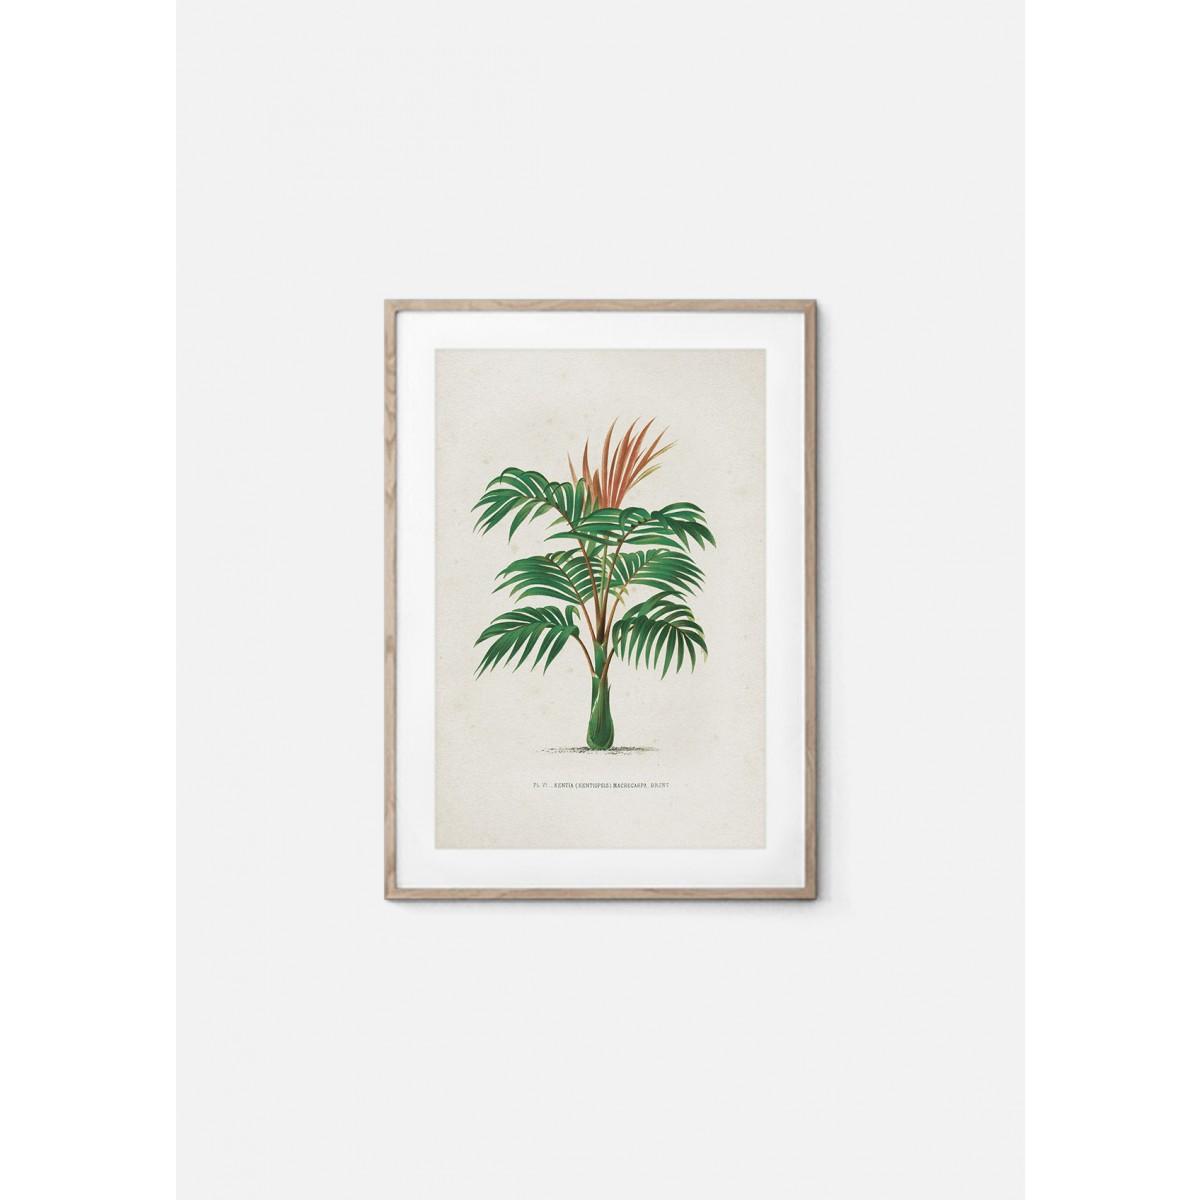 JOE MANIA / Vintage Artprint Poster / Kerchove - Les Palmiers 6